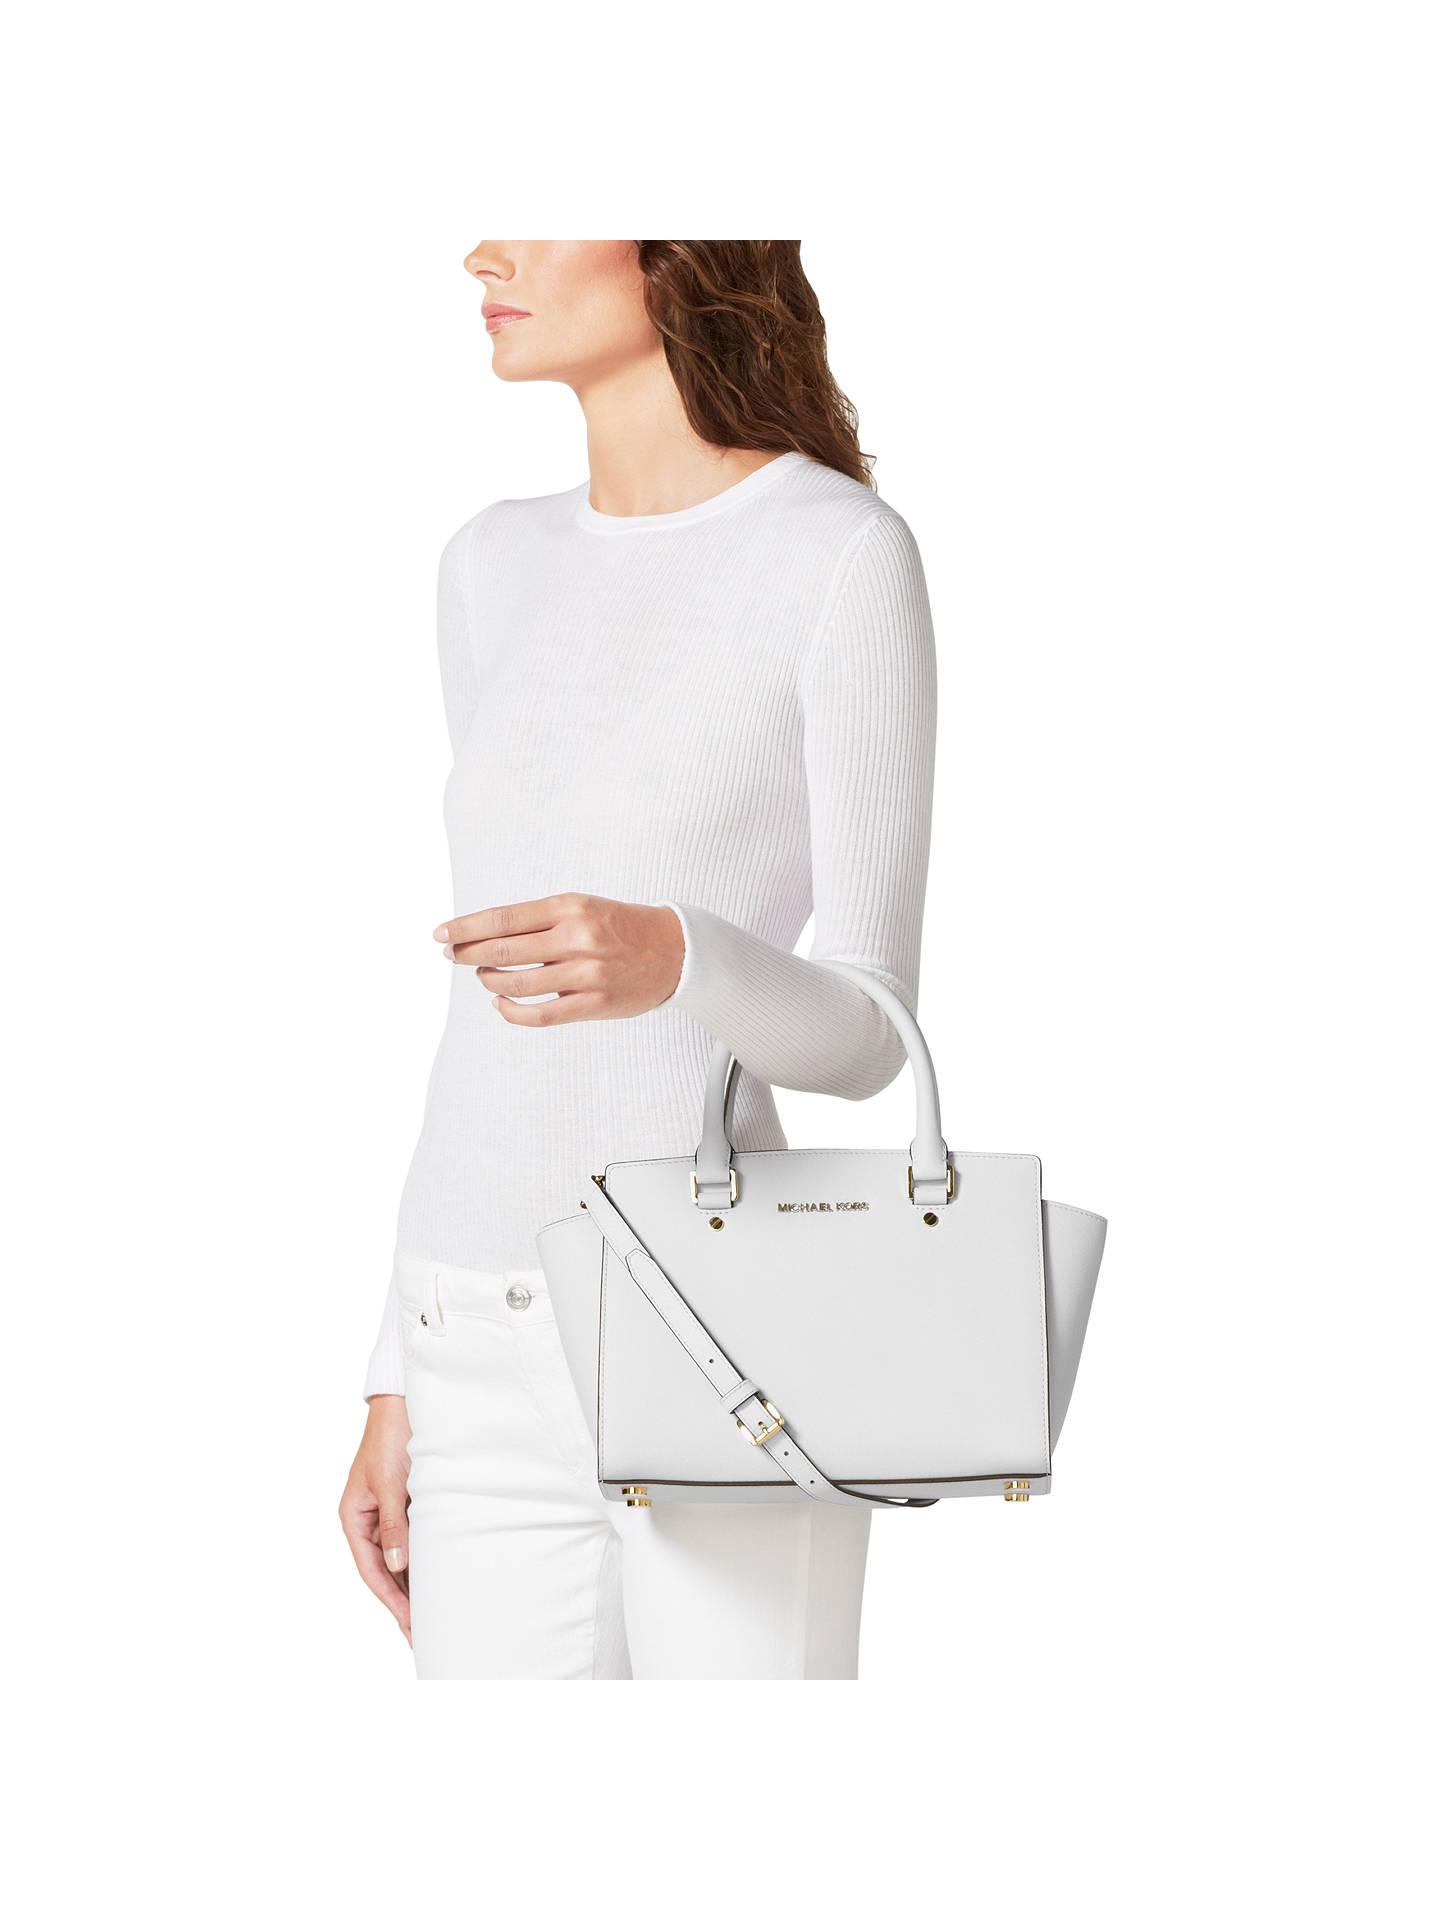 73b4e3937 Buy MICHAEL Michael Kors Selma Saffiano Medium Leather Satchel, Optic White  Online at johnlewis.